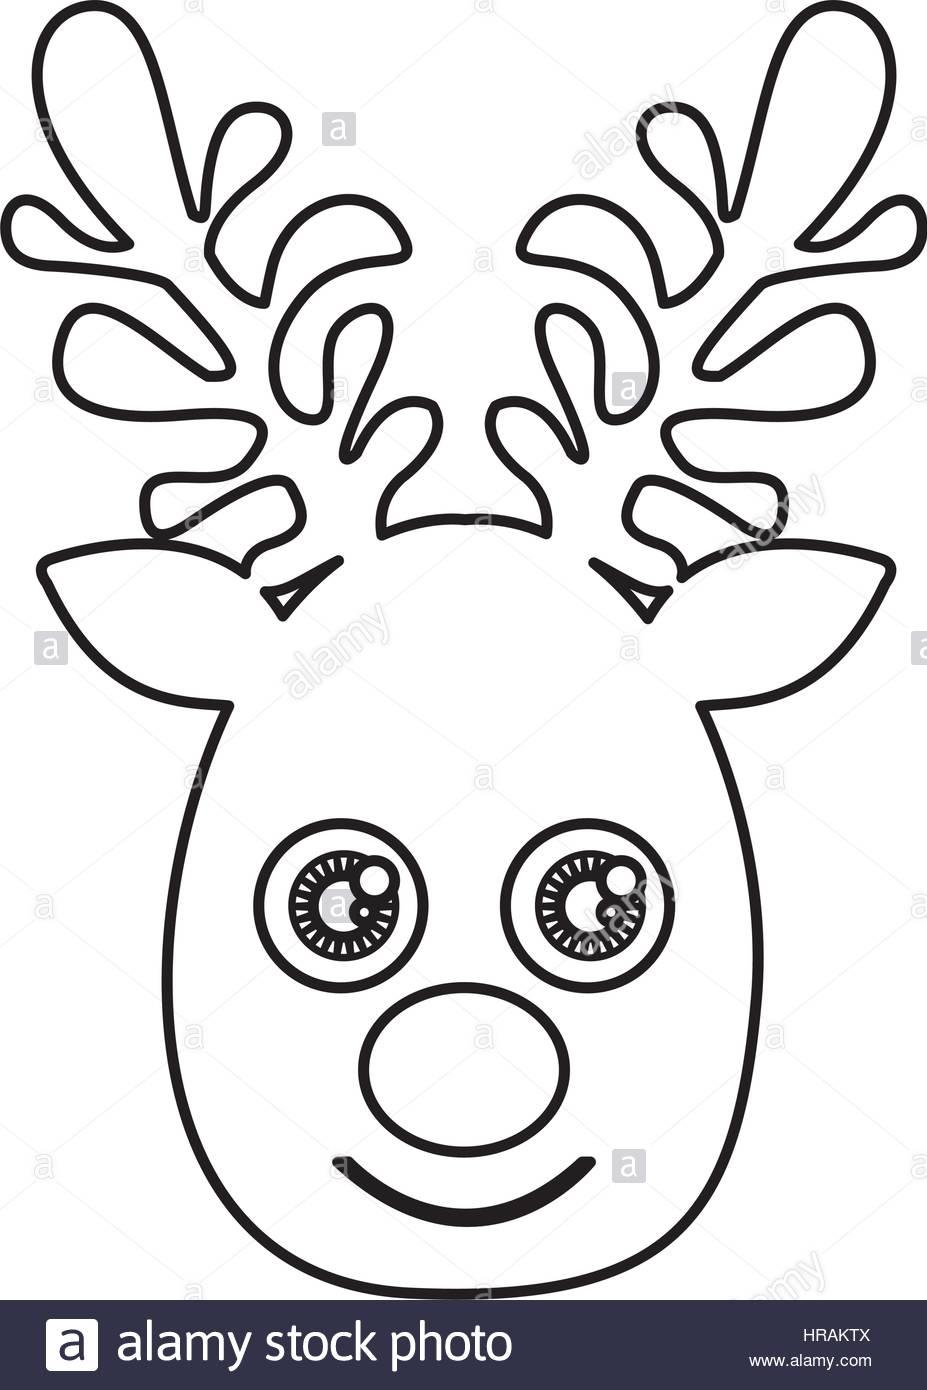 927x1390 Silhouette Cute Face Reindeer Animal Stock Vector Art